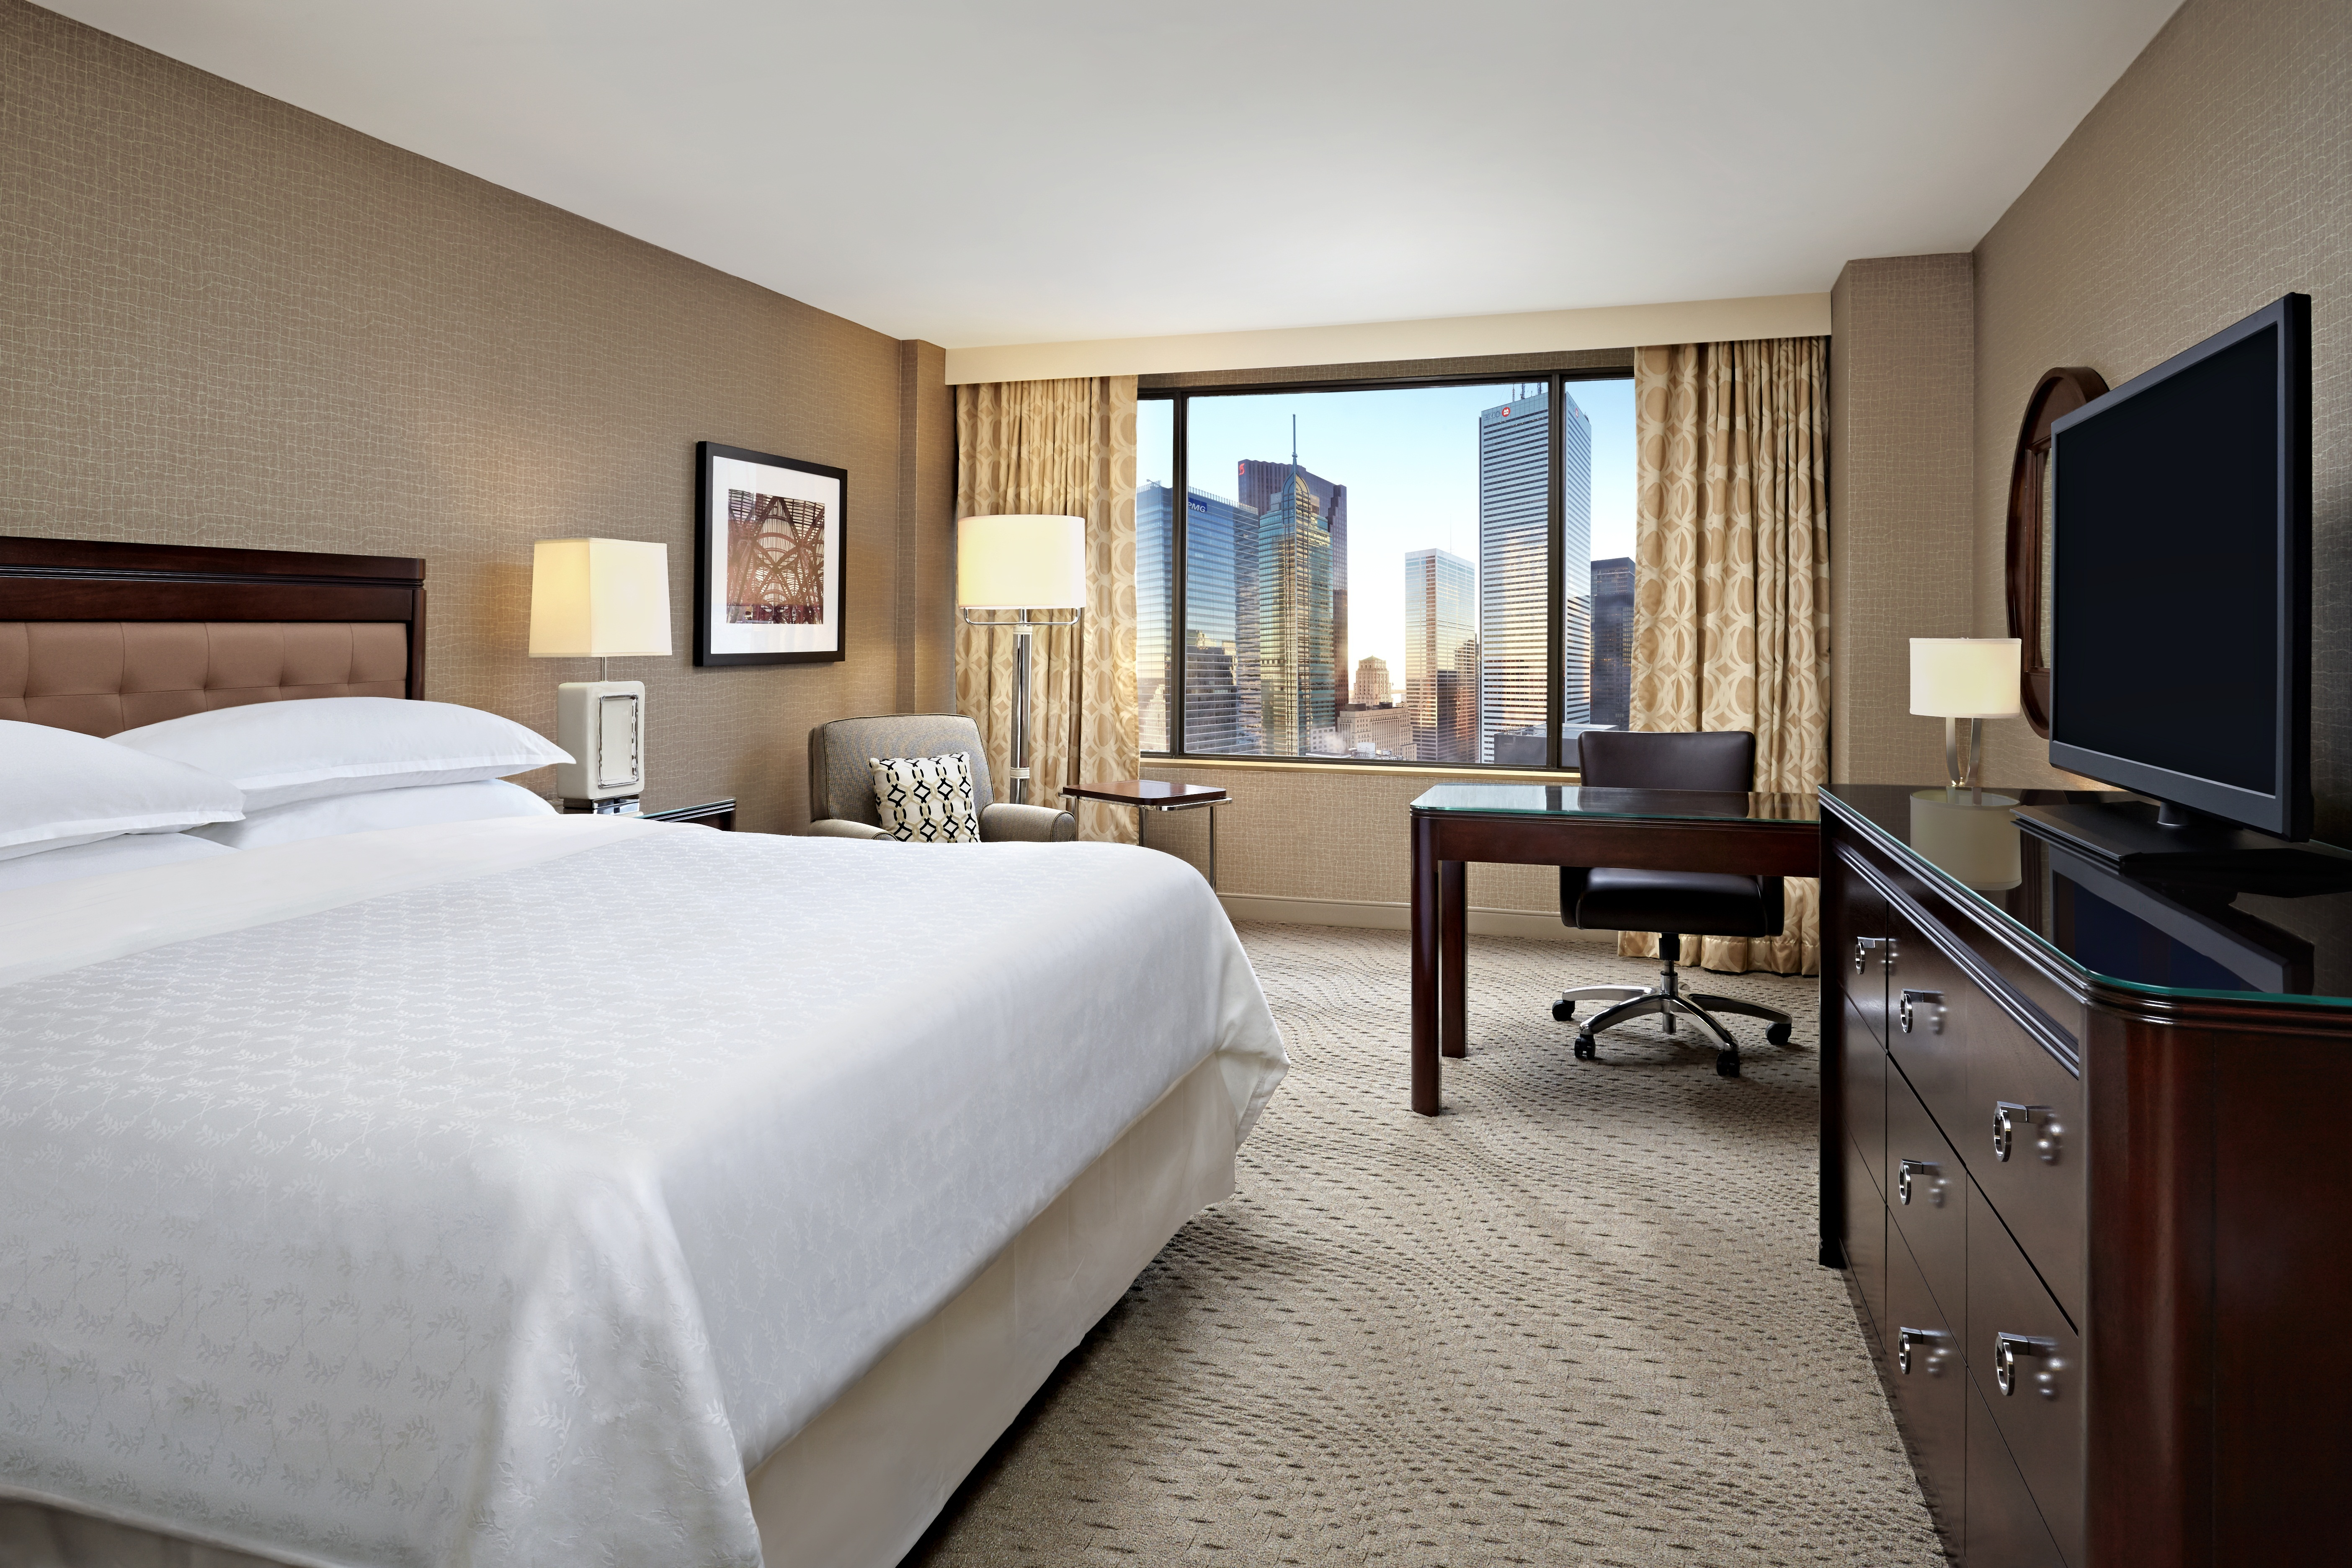 Starwood Hotels Resorts Dan Young 416 947 4948 Starwoodhotels Or Cynthia Bond